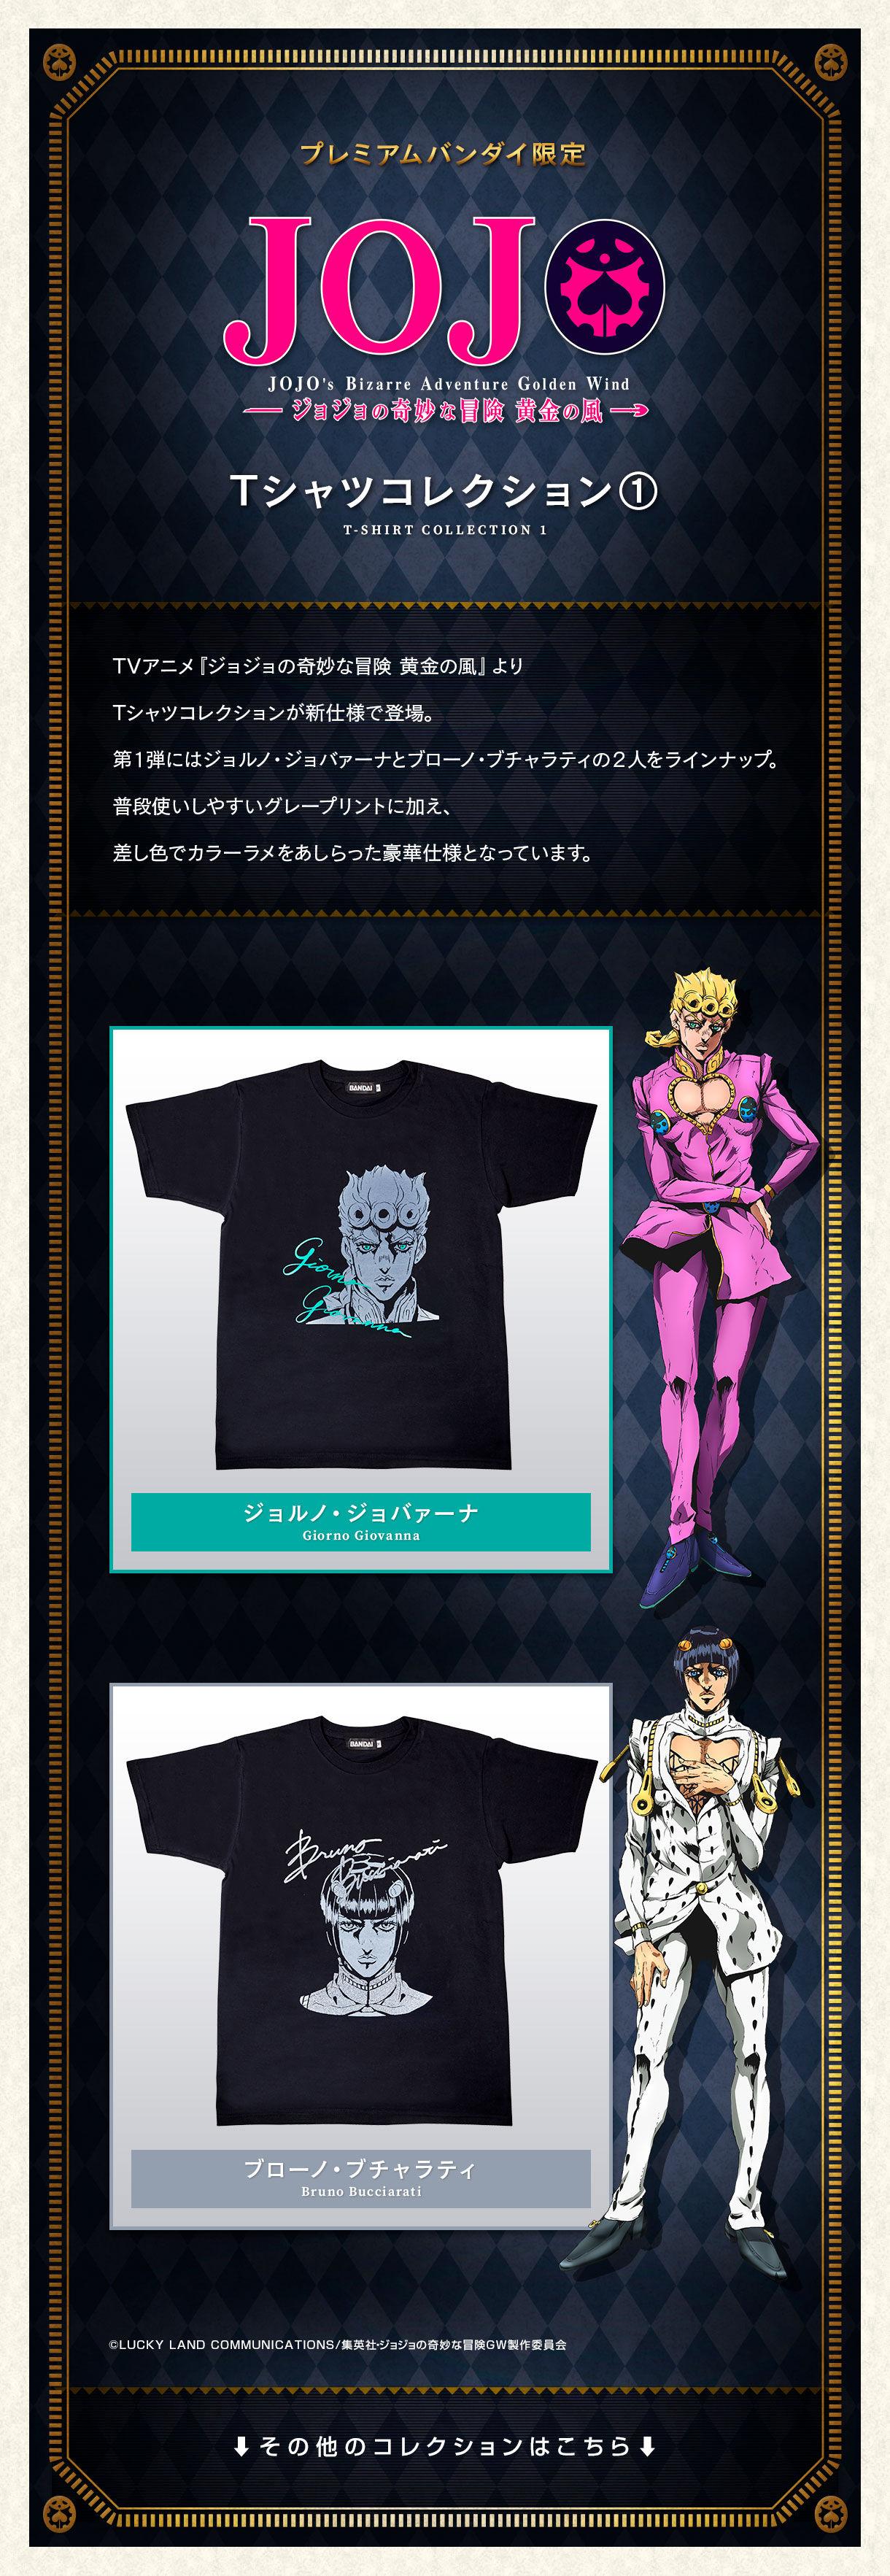 Link a premium_bandai_jojos_bizarre_adventure_t-shirt-5